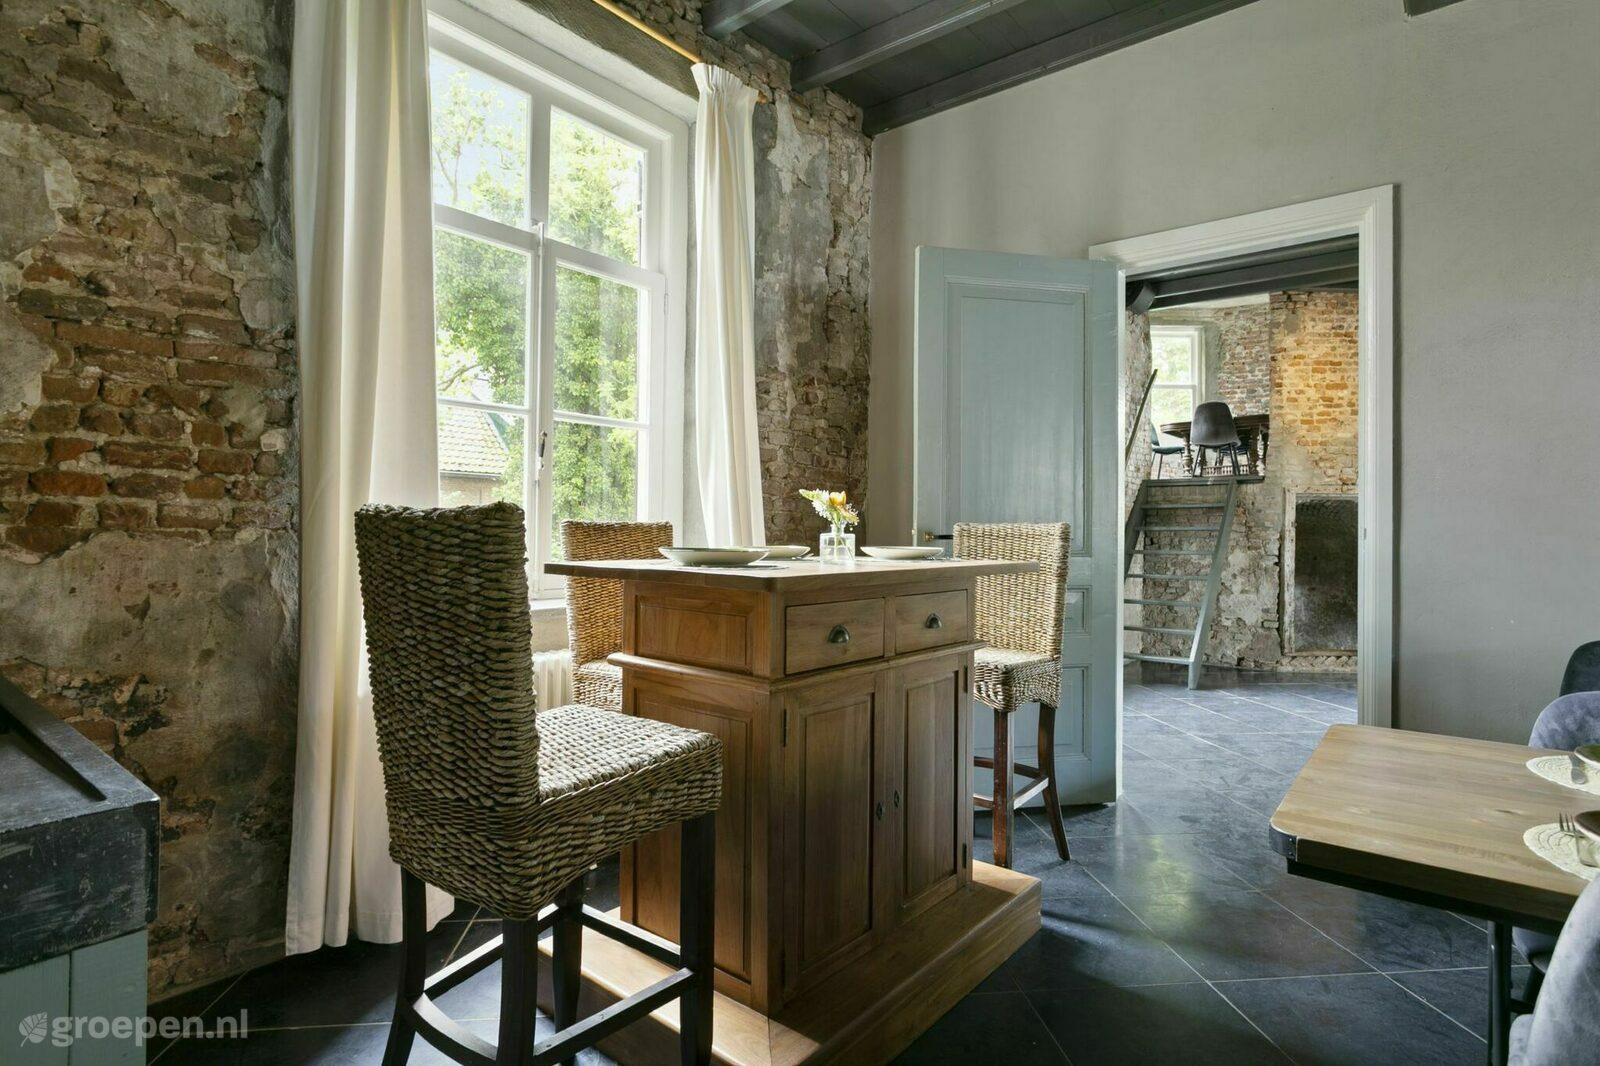 Group accommodation Oijen